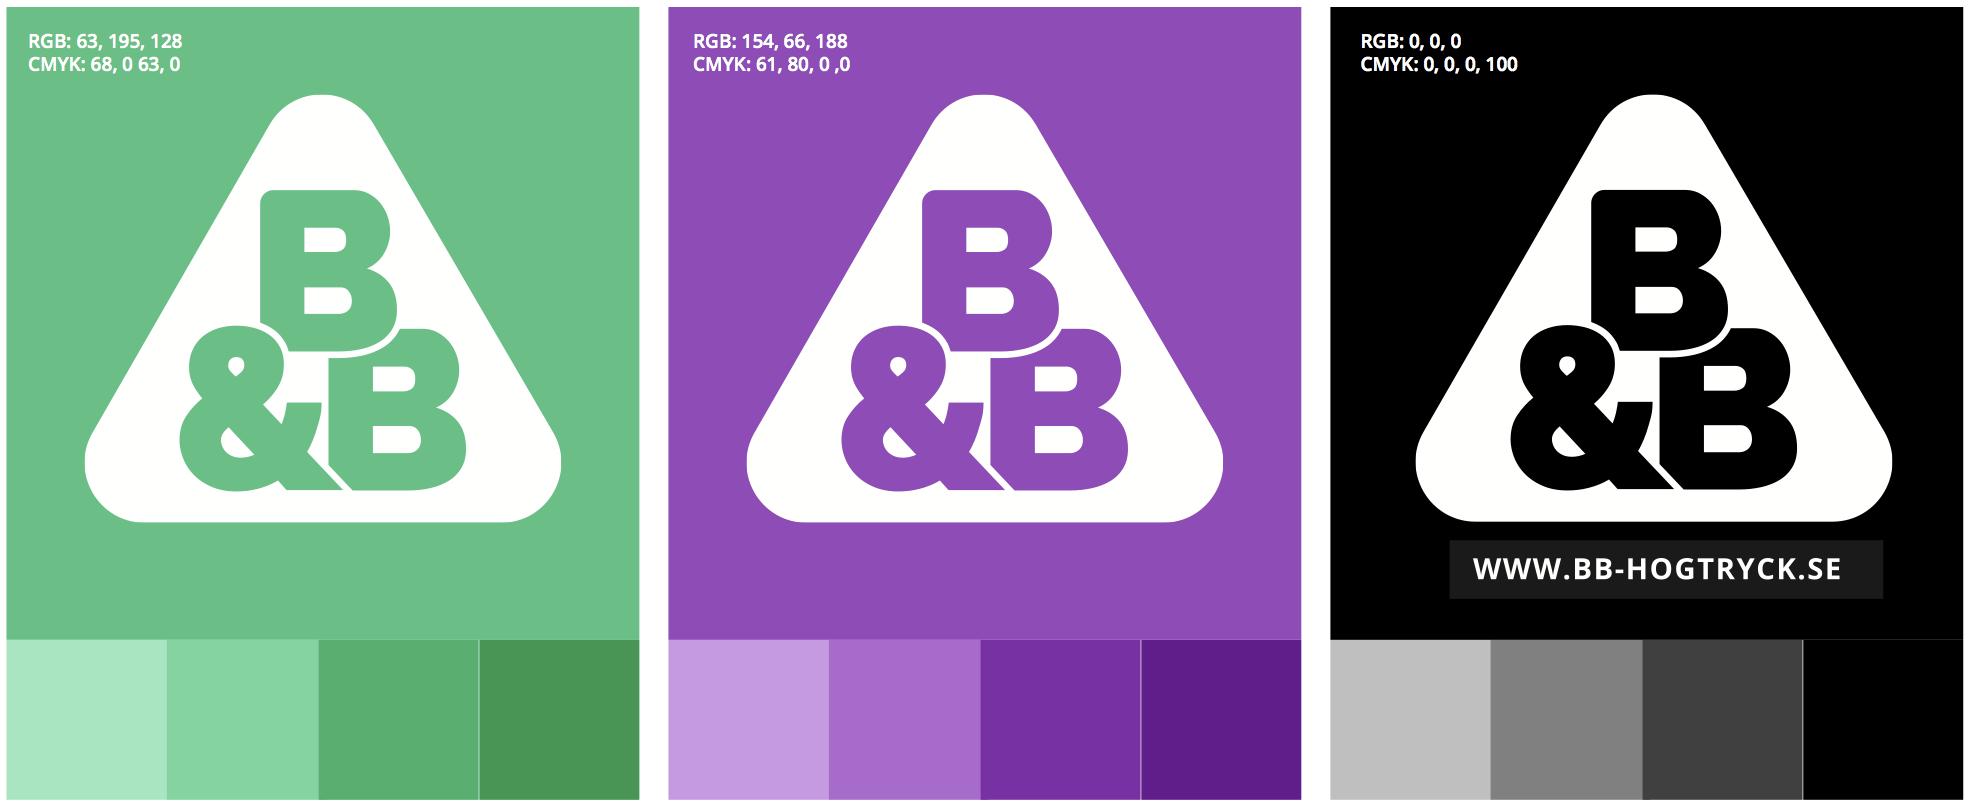 b&b-logo-green-purple-black.png